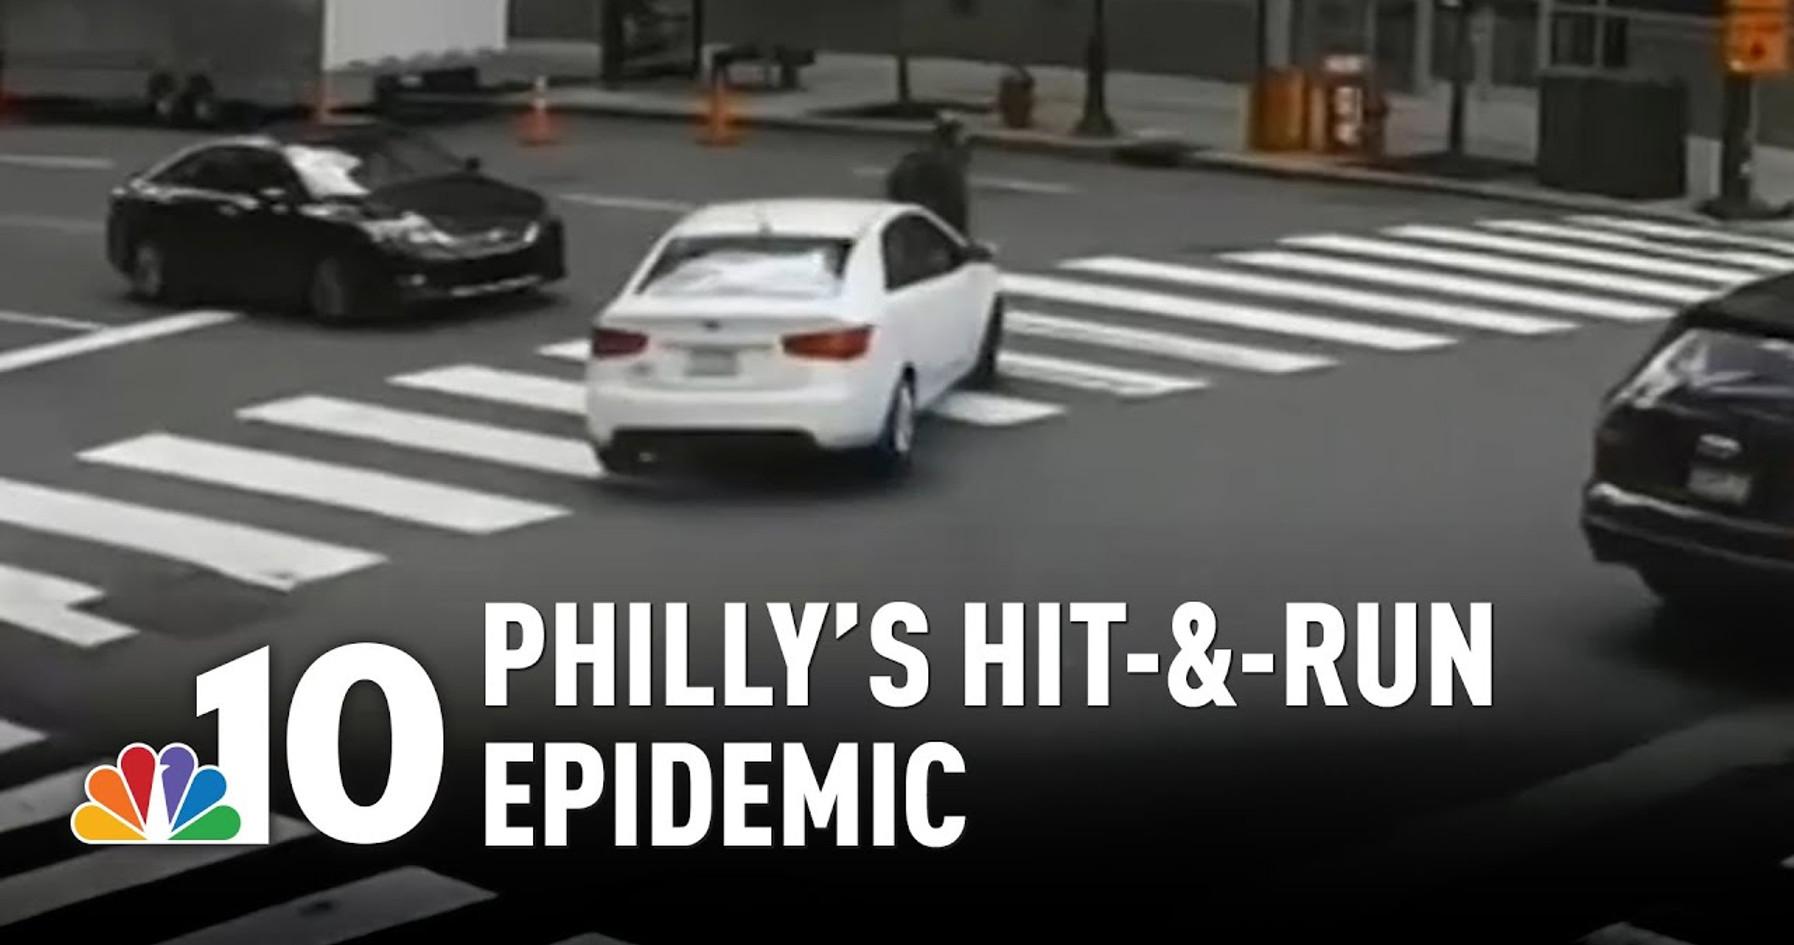 Philly's Hit-&-Run Epidemic